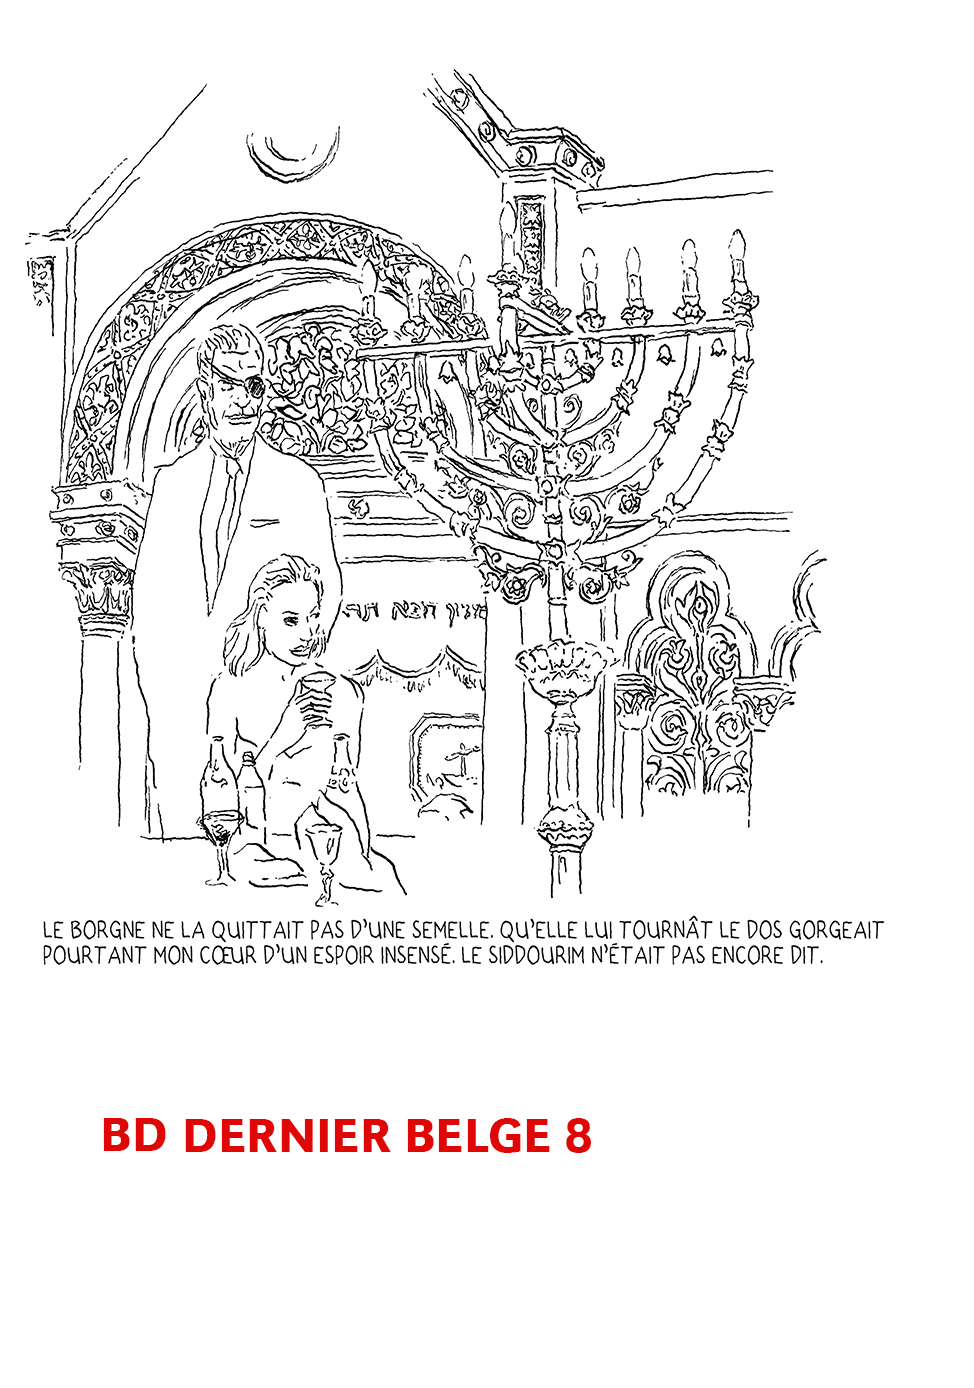 bd_dernier belge_8